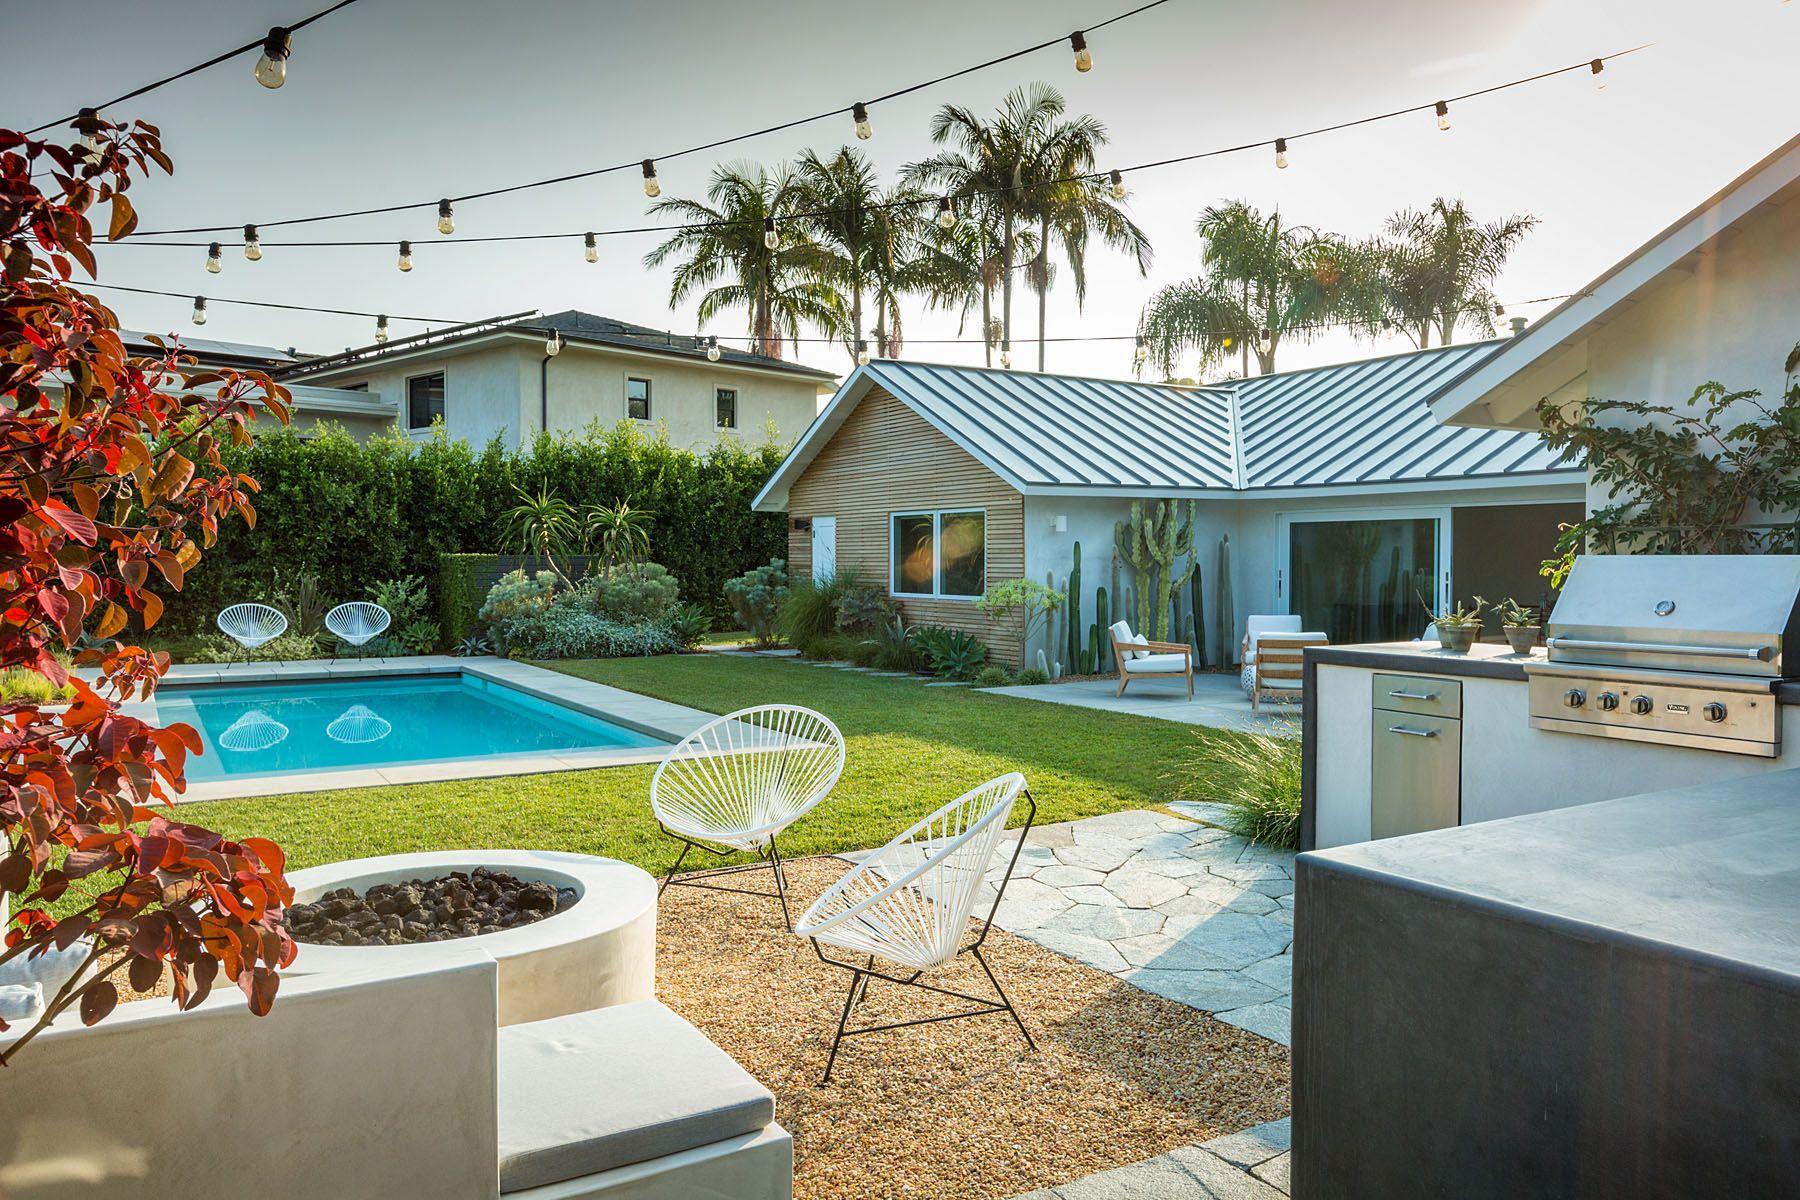 Pin by Luke Vanvoorhis on Backyard | Sustainable ...